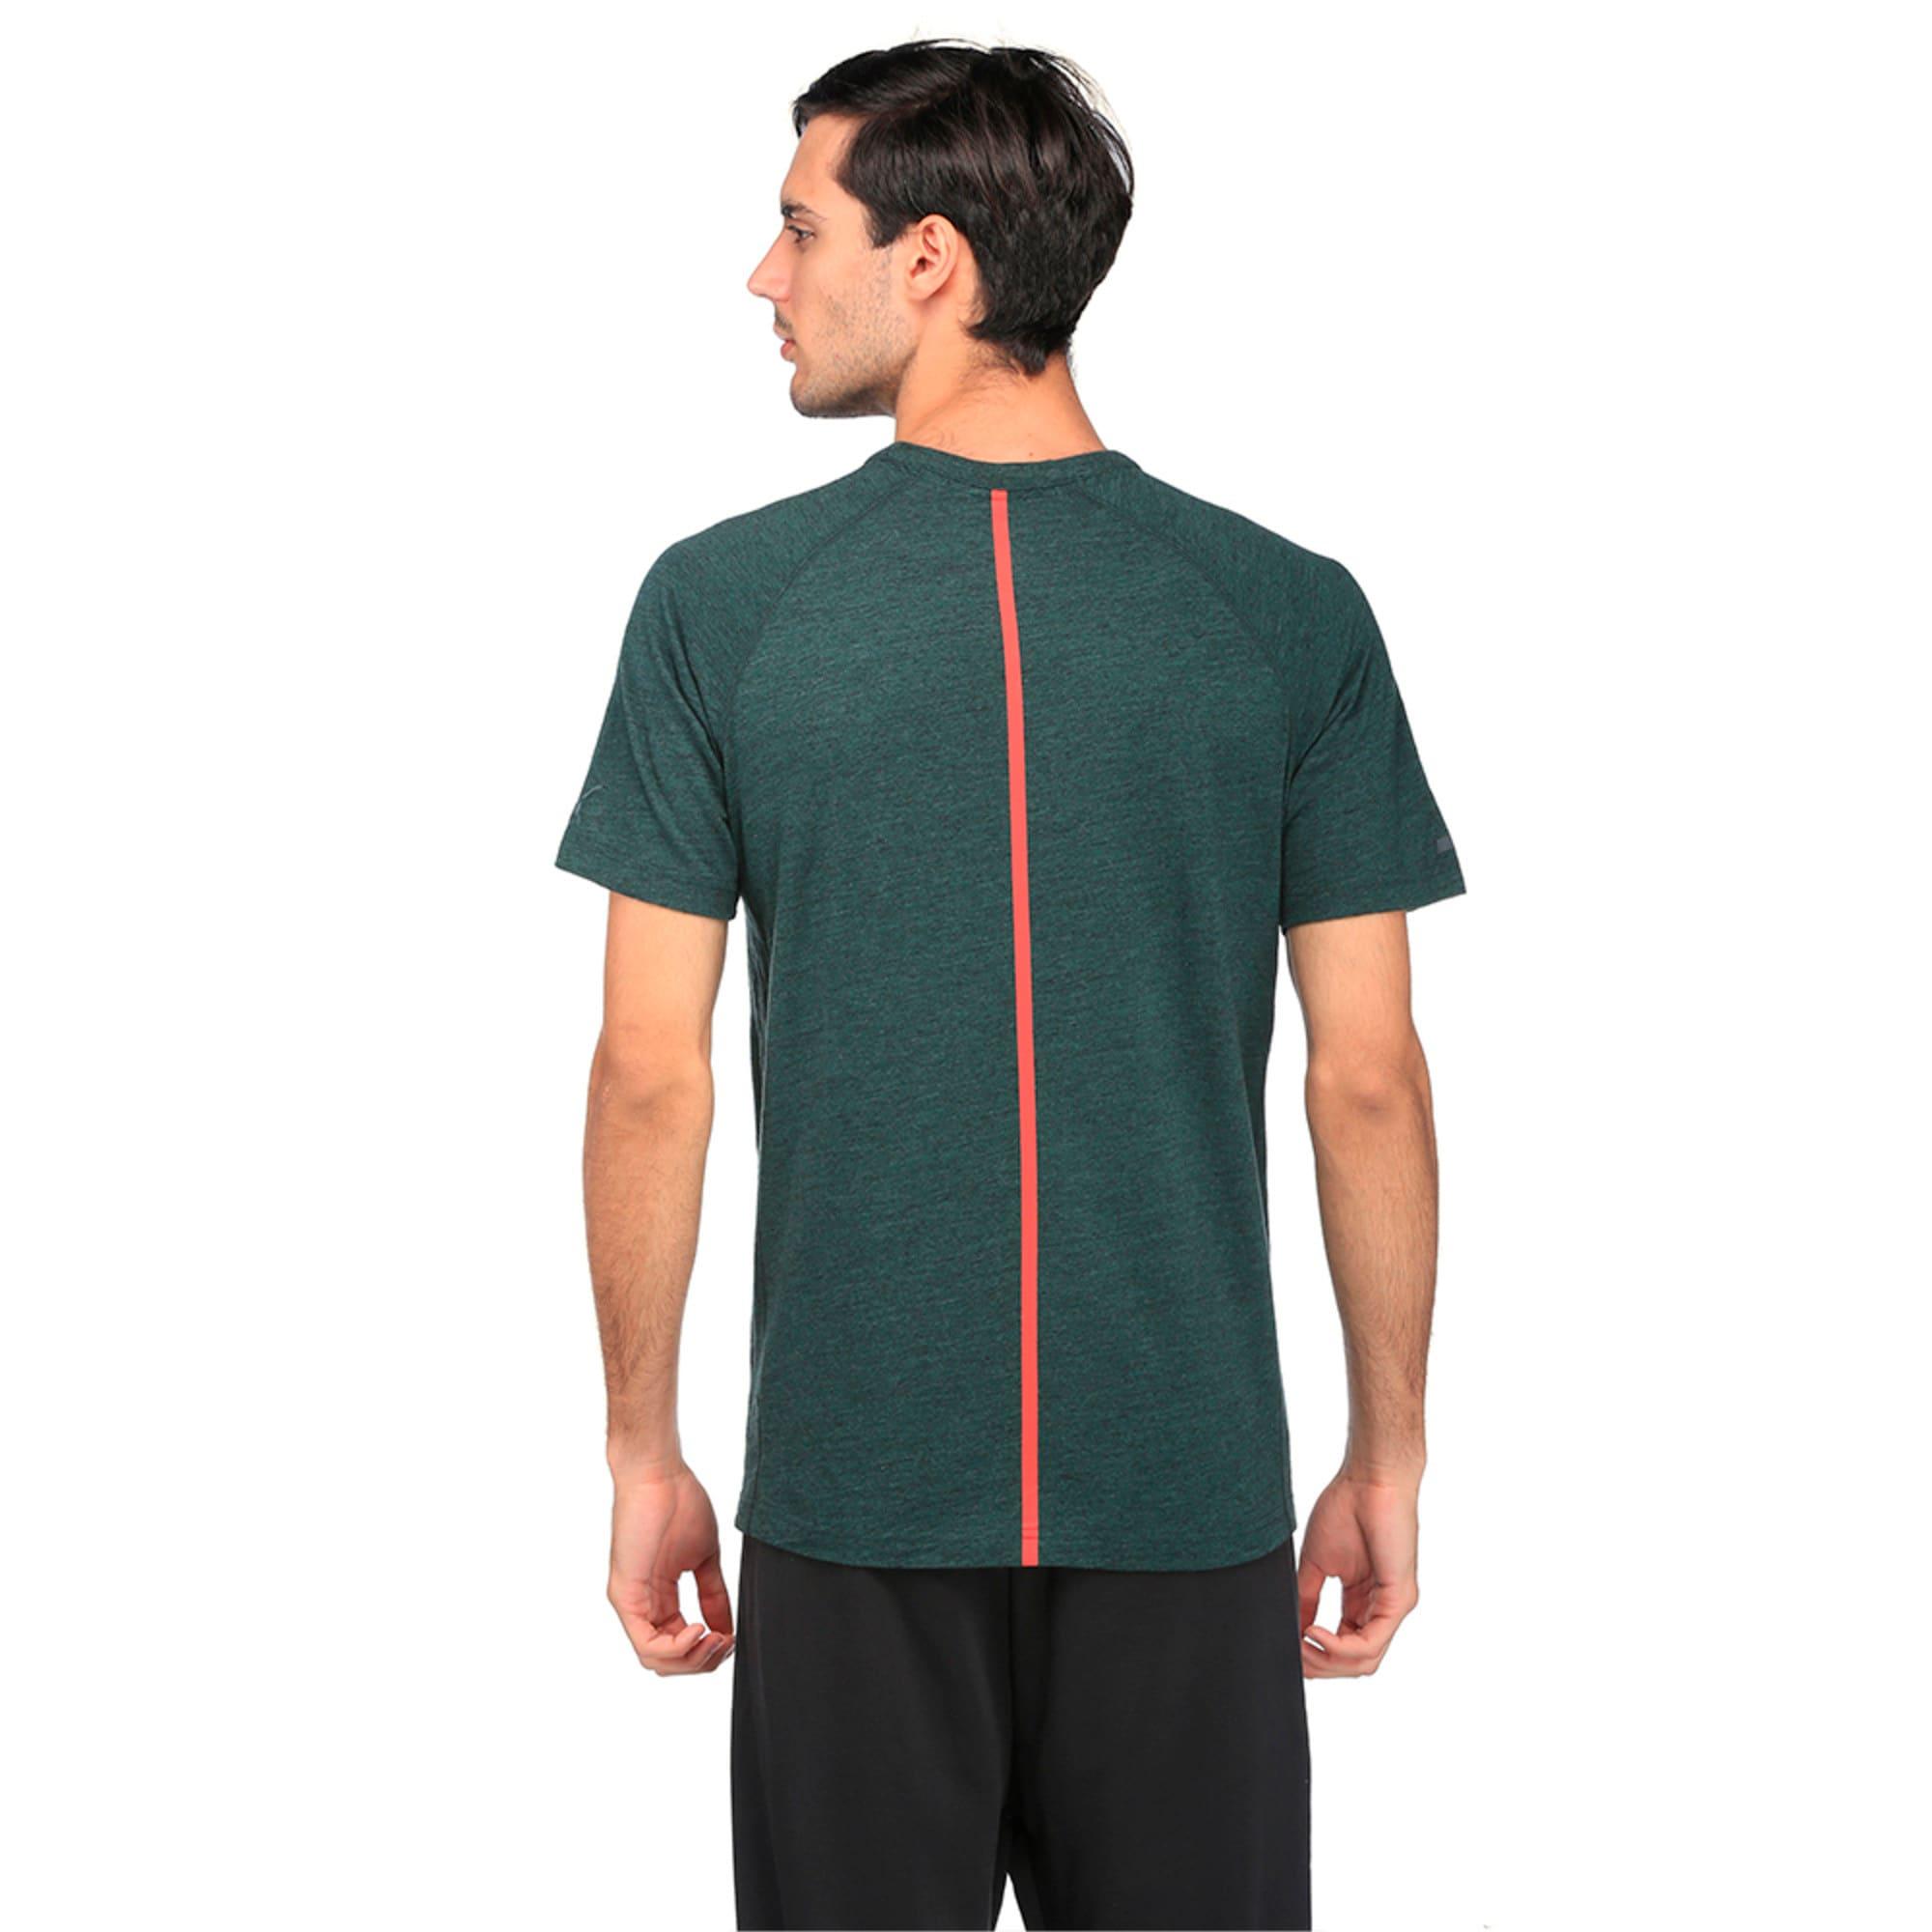 Thumbnail 1 of Ferrari Lifestyle Men's Small Shield T-Shirt, Green Gables Heather, medium-IND